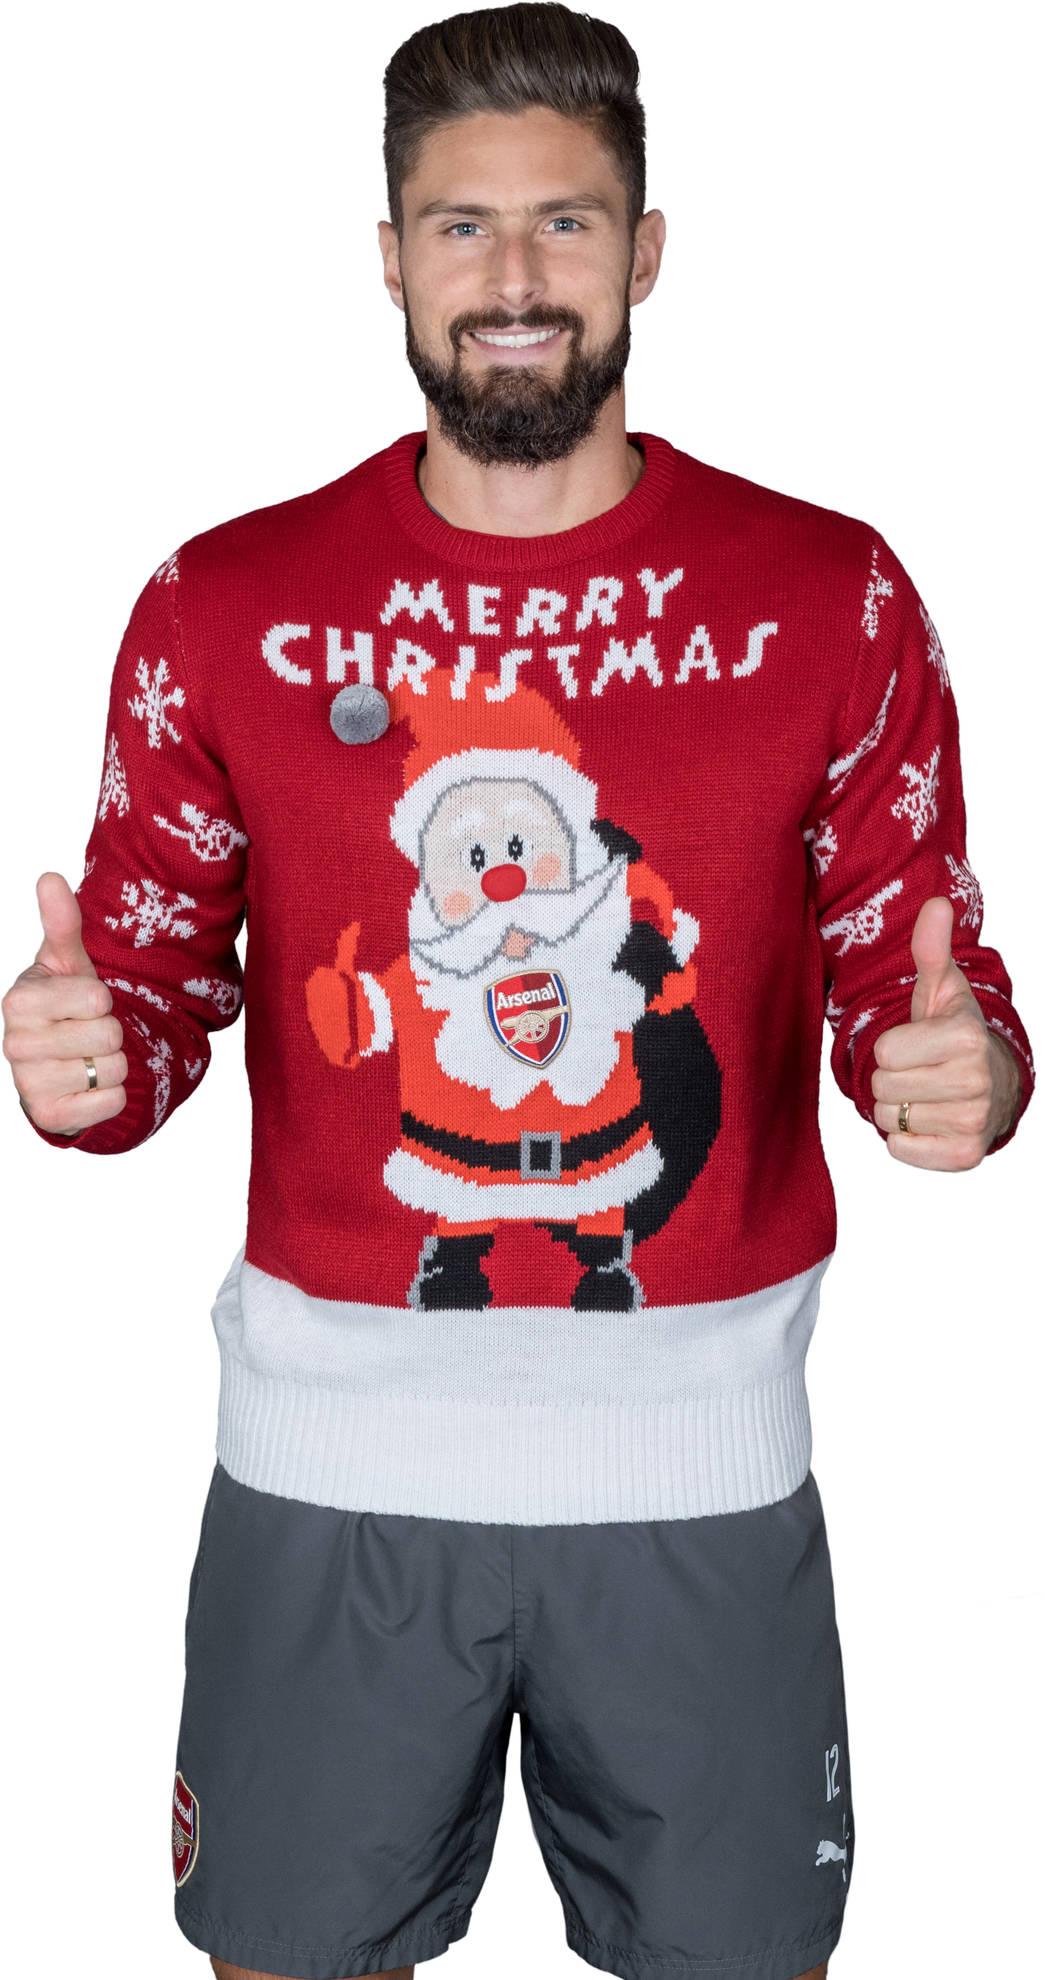 Blackpool fc christmas jumper dress